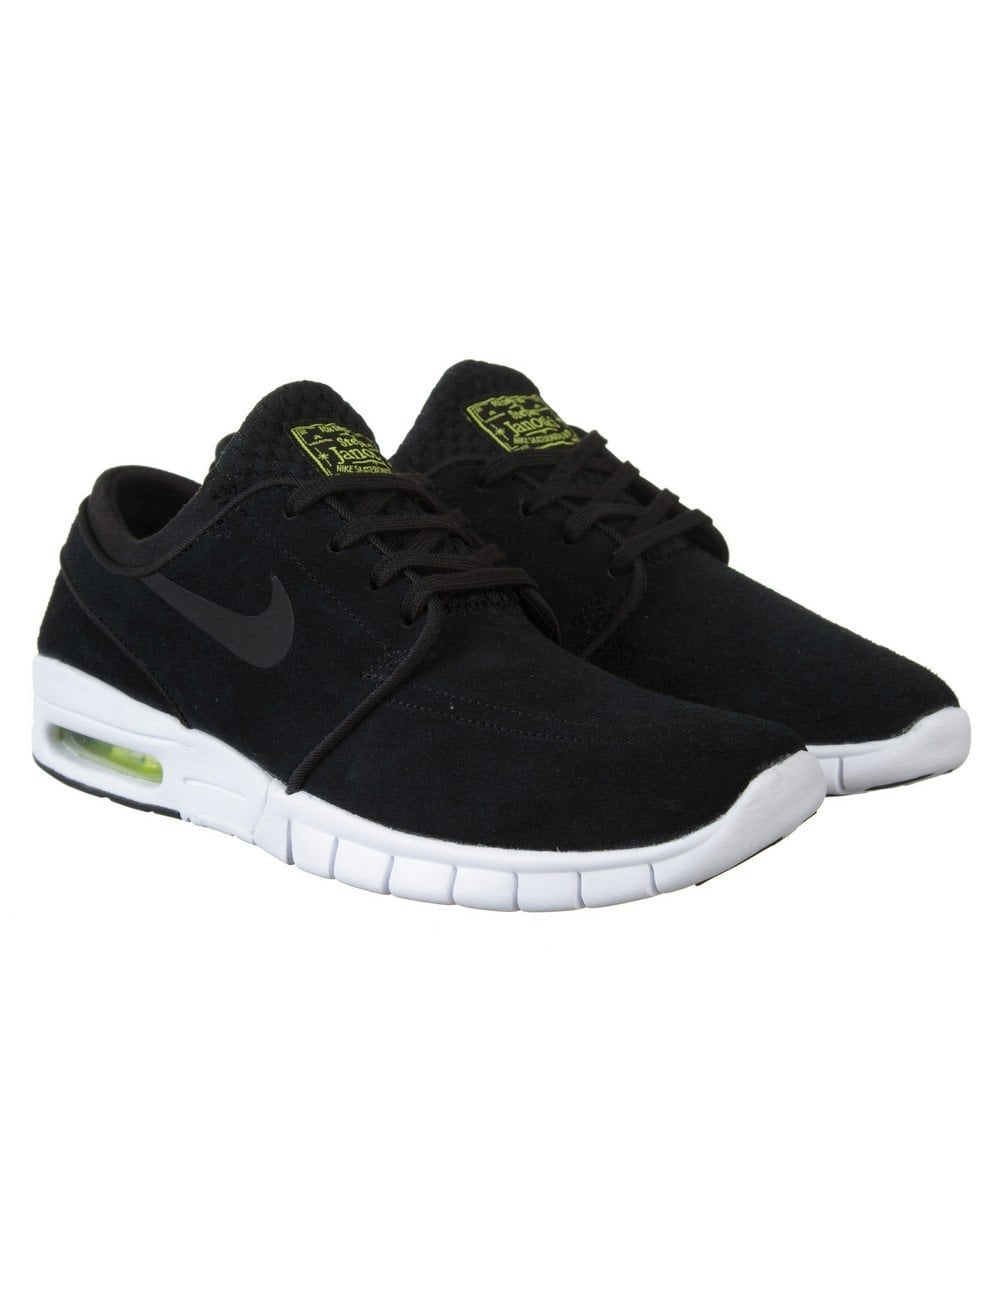 sale retailer 1bcfd d3a1e Nike SB Stefan Janoski Max L Shoes - Blk Blk Wht